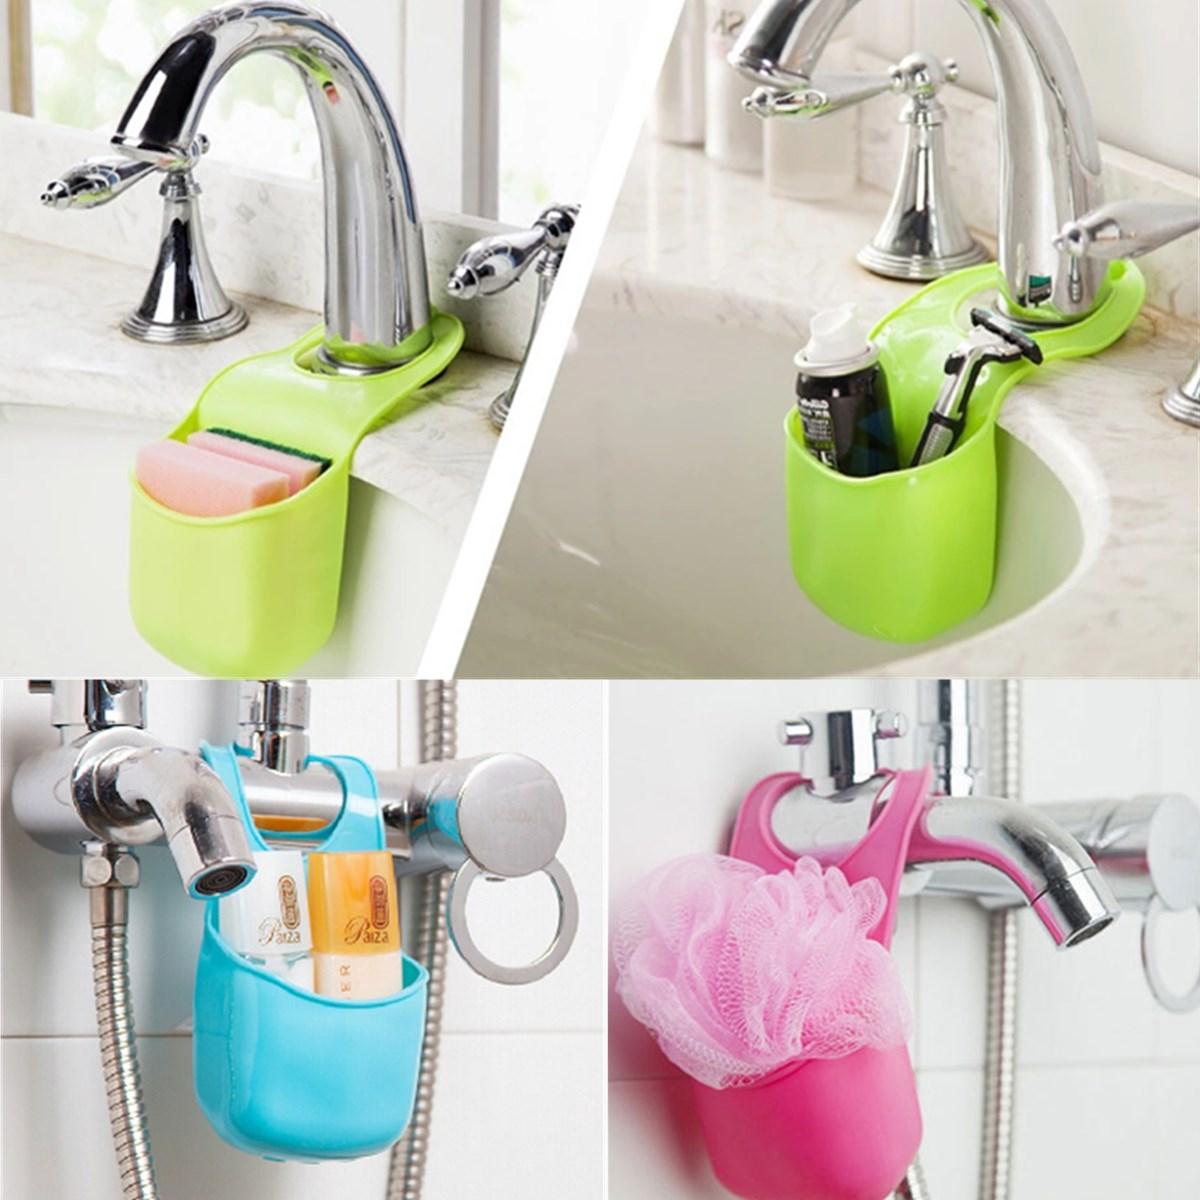 New Novelty Button Design Kitchen Sink Bathroom PVC Hanging Strainer Organizer Sponge Holder Dryer Bag 3Colors Sent Randomly(China (Mainland))